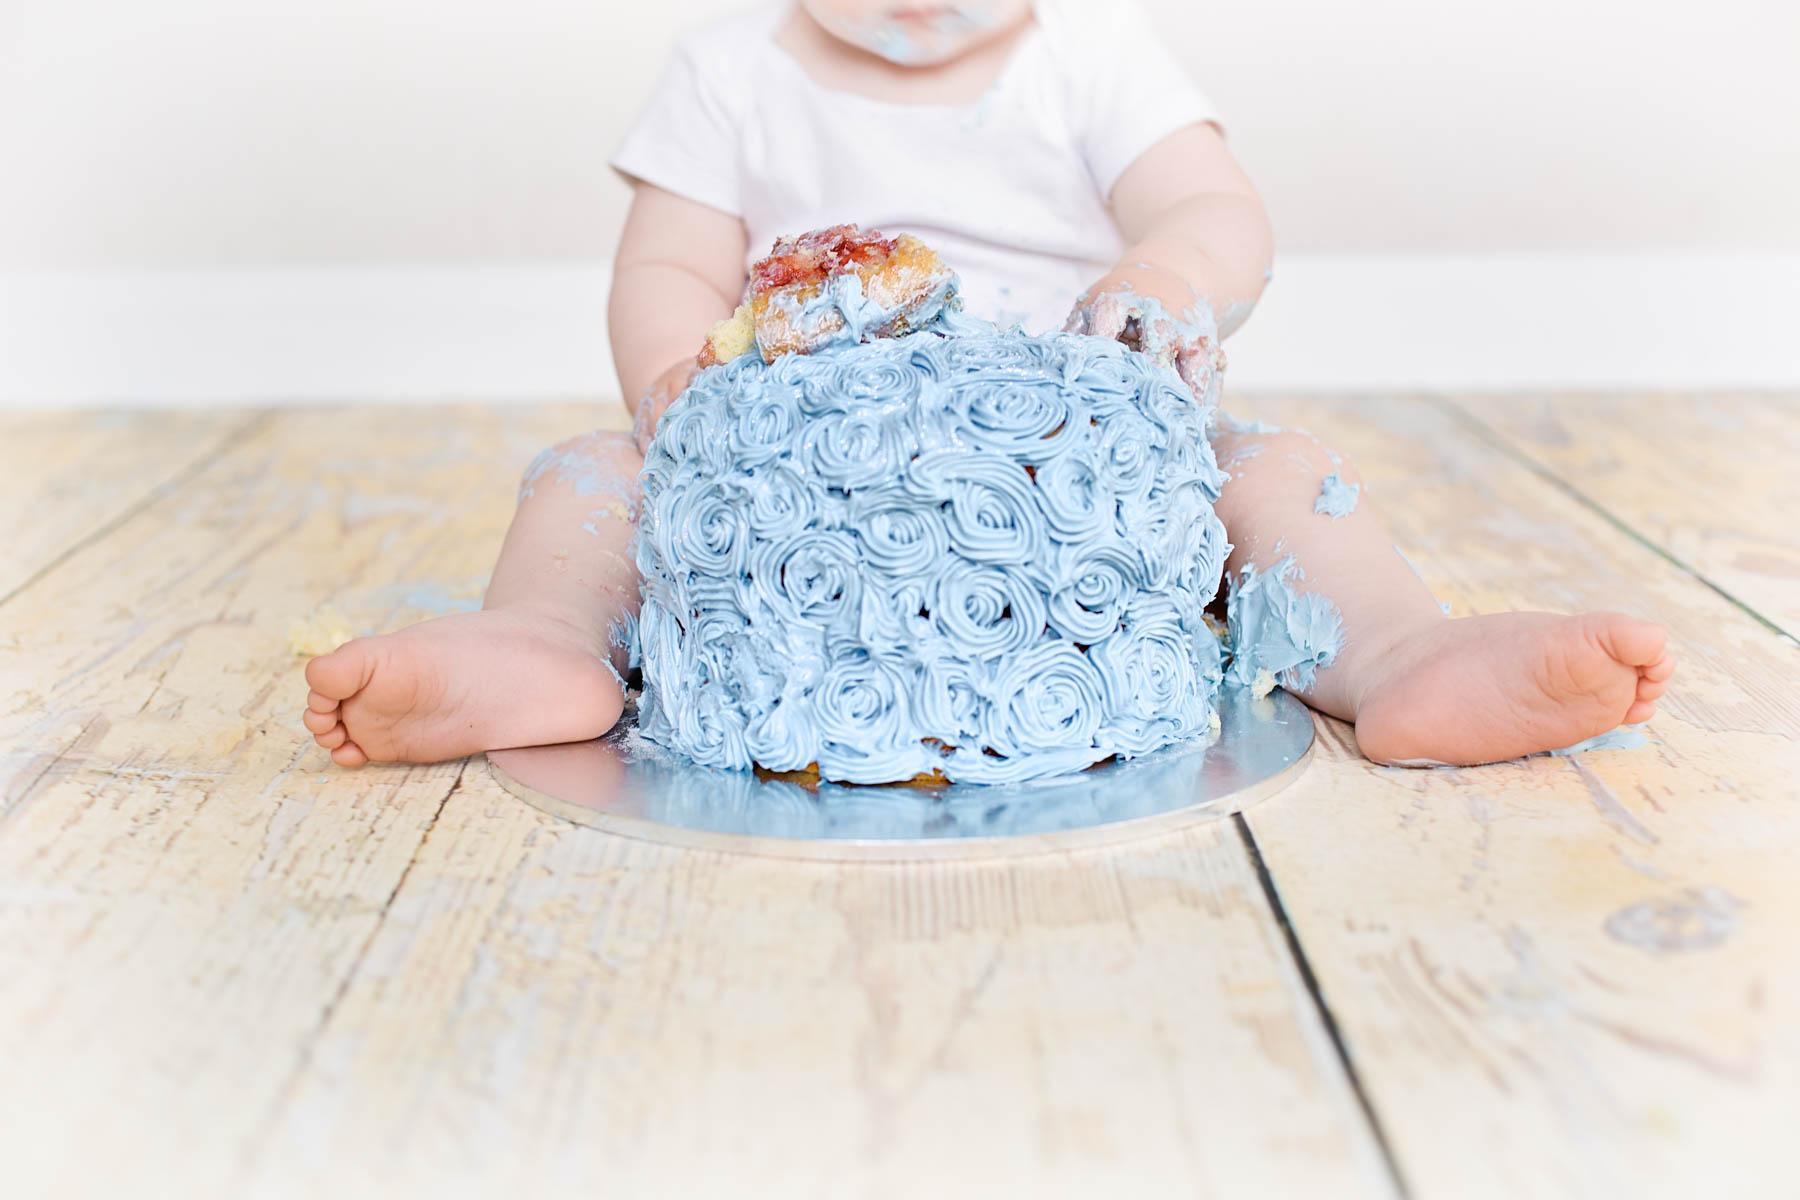 Cake-Smash-Photography-Glasgow-South-Lanarkshire-Dawn-Martin022